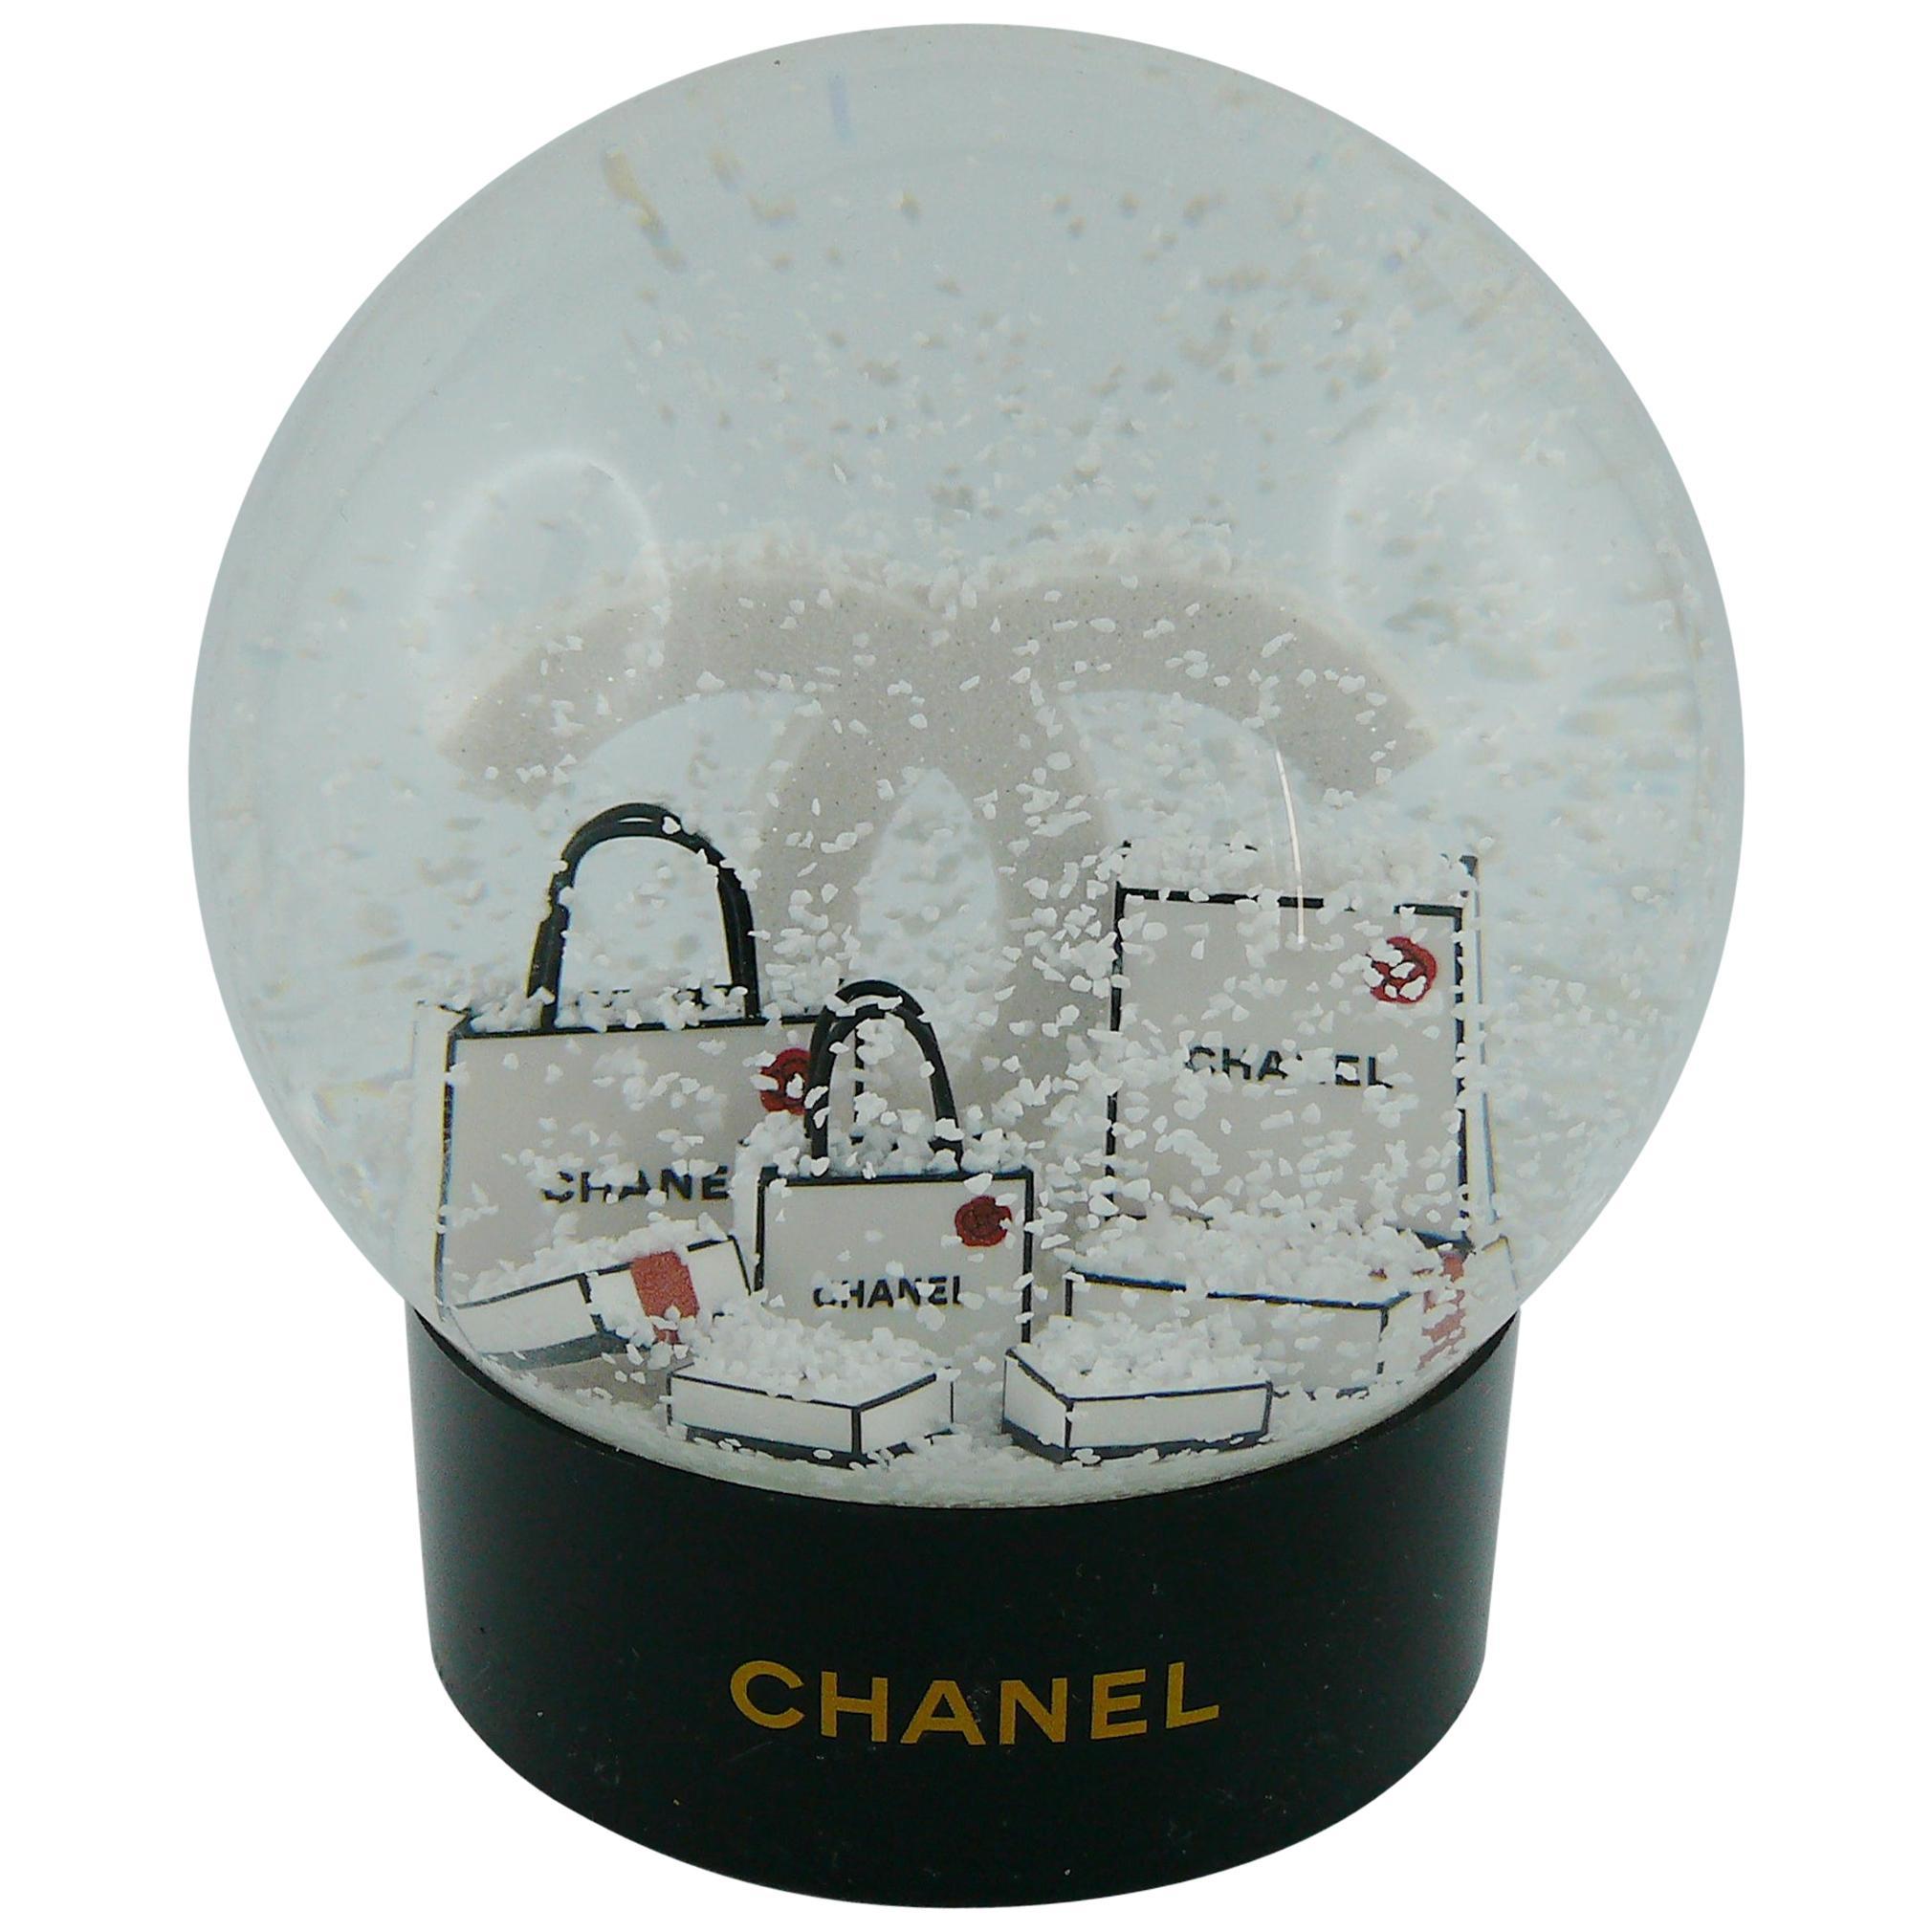 Chanel Snow Dome